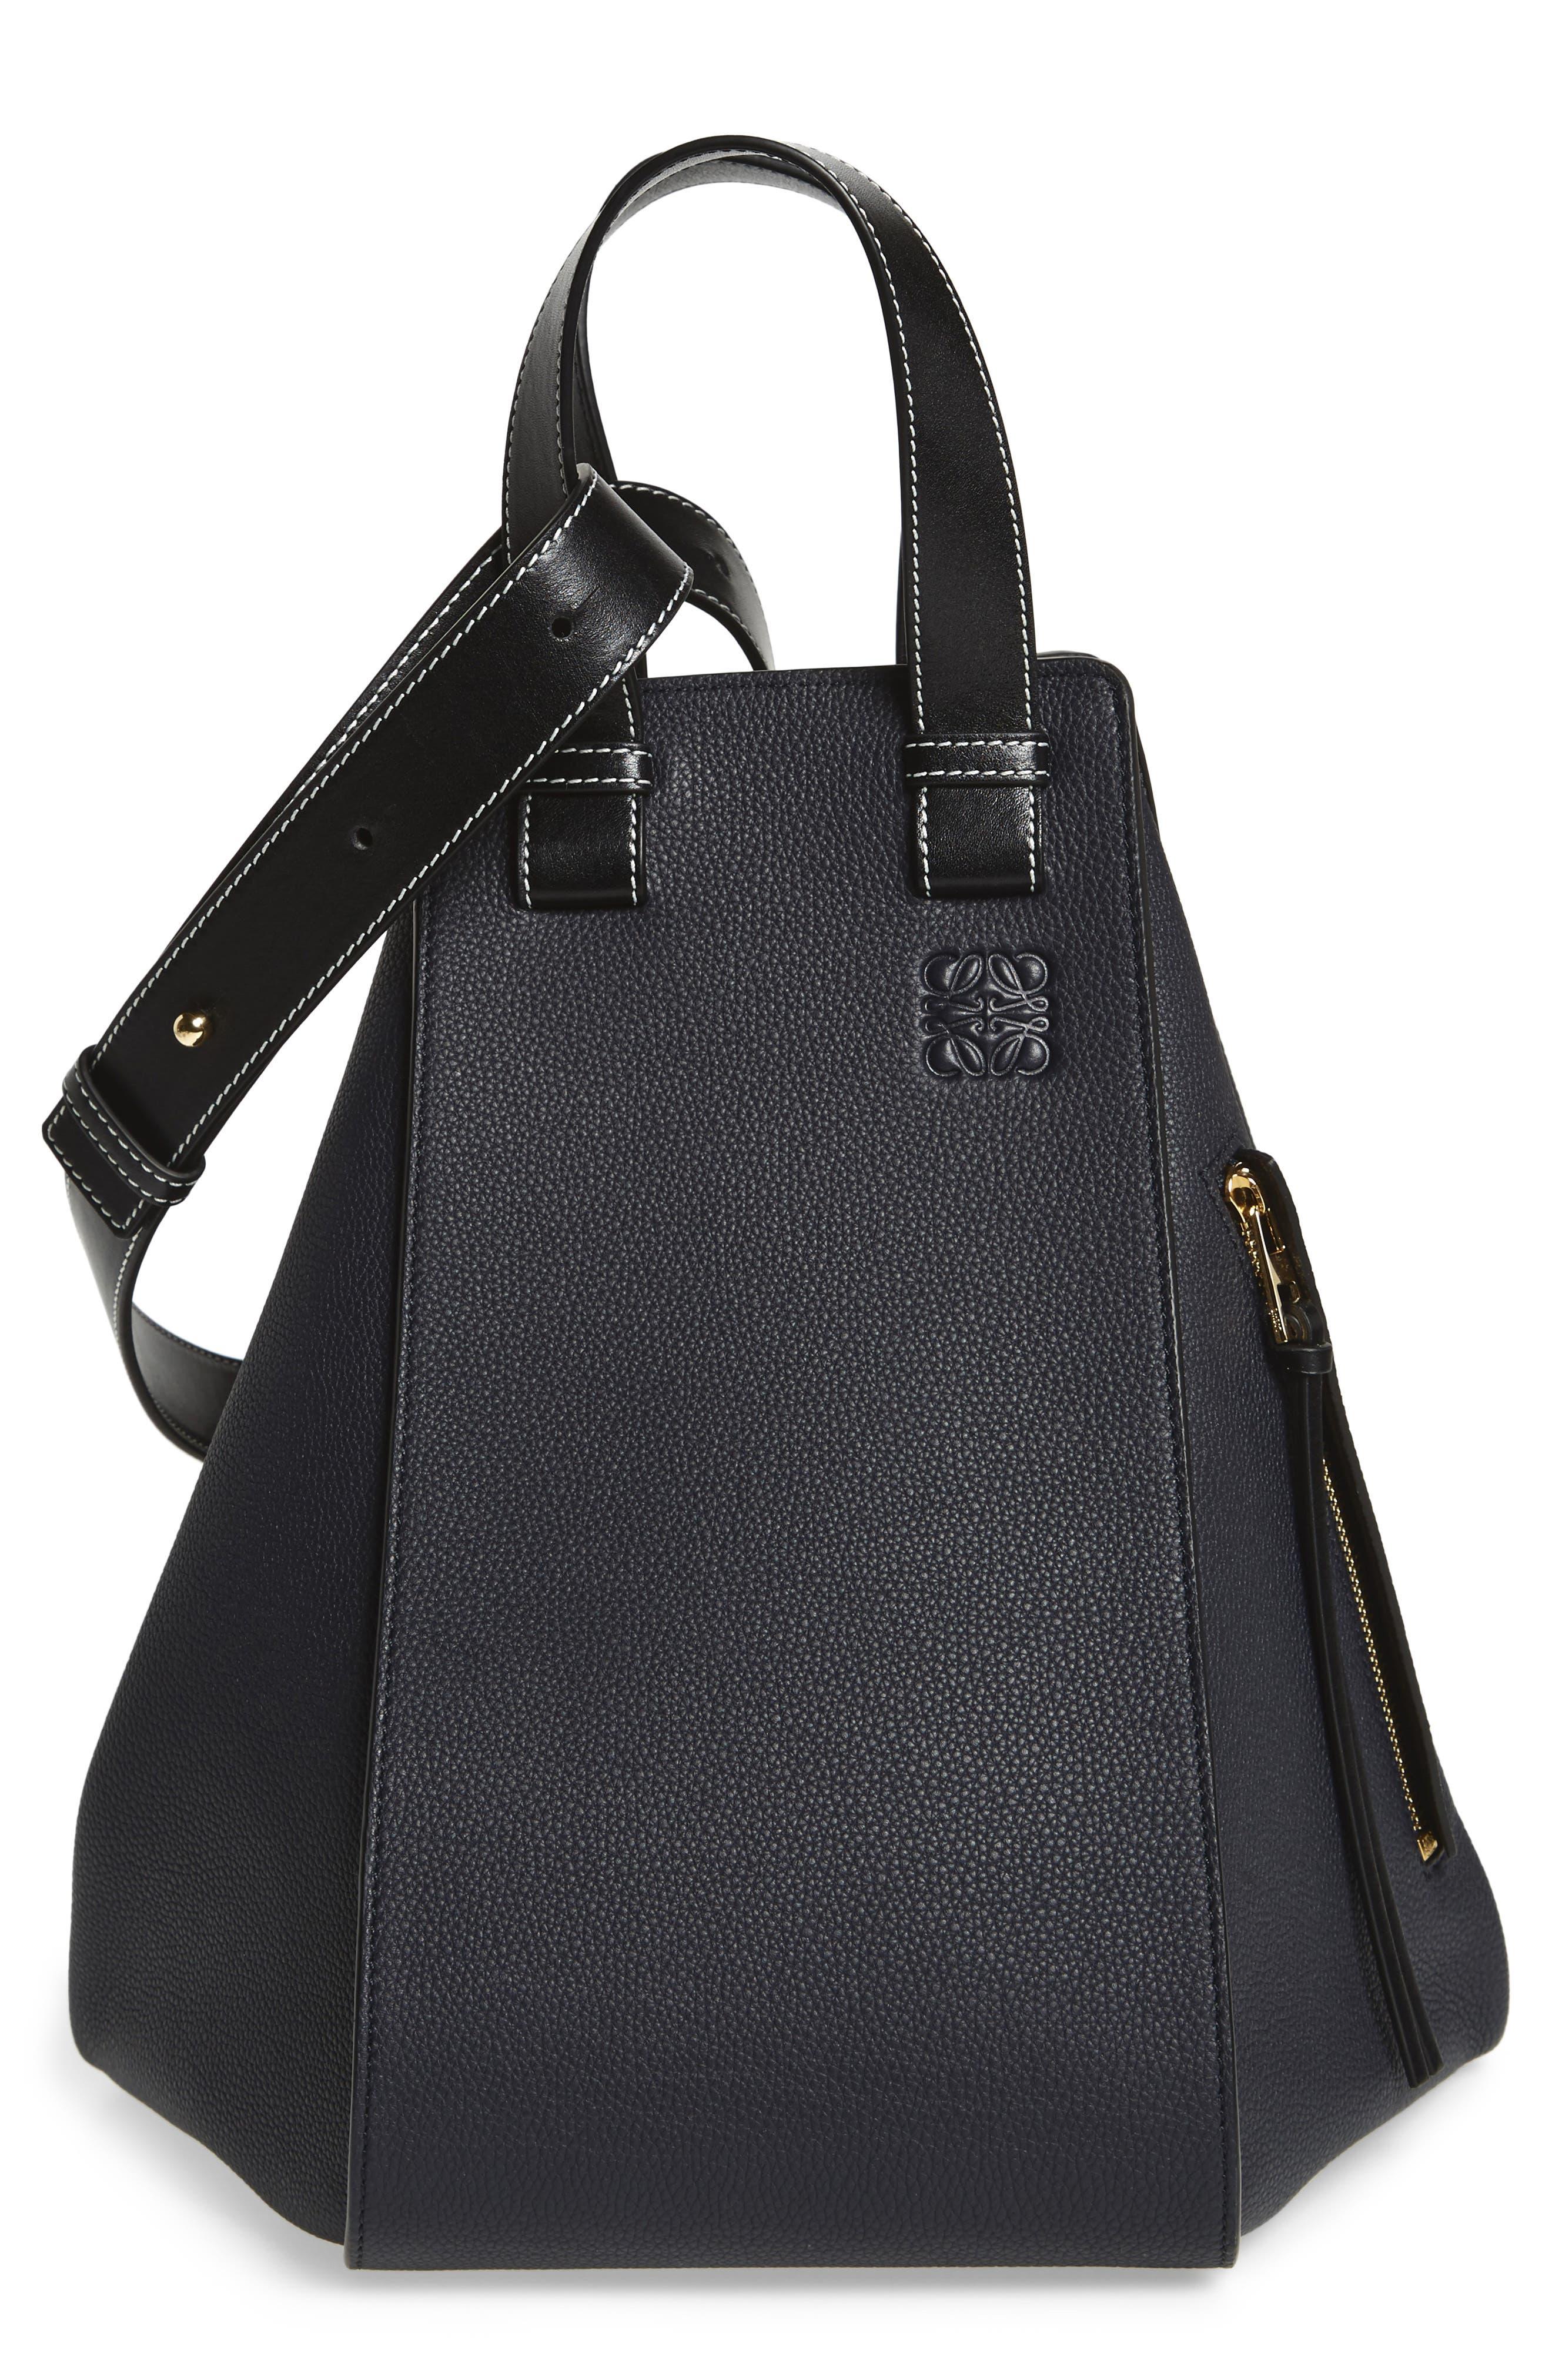 Alternate Image 1 Selected - Loewe Medium Hammock Calfskin Leather Shoulder Bag